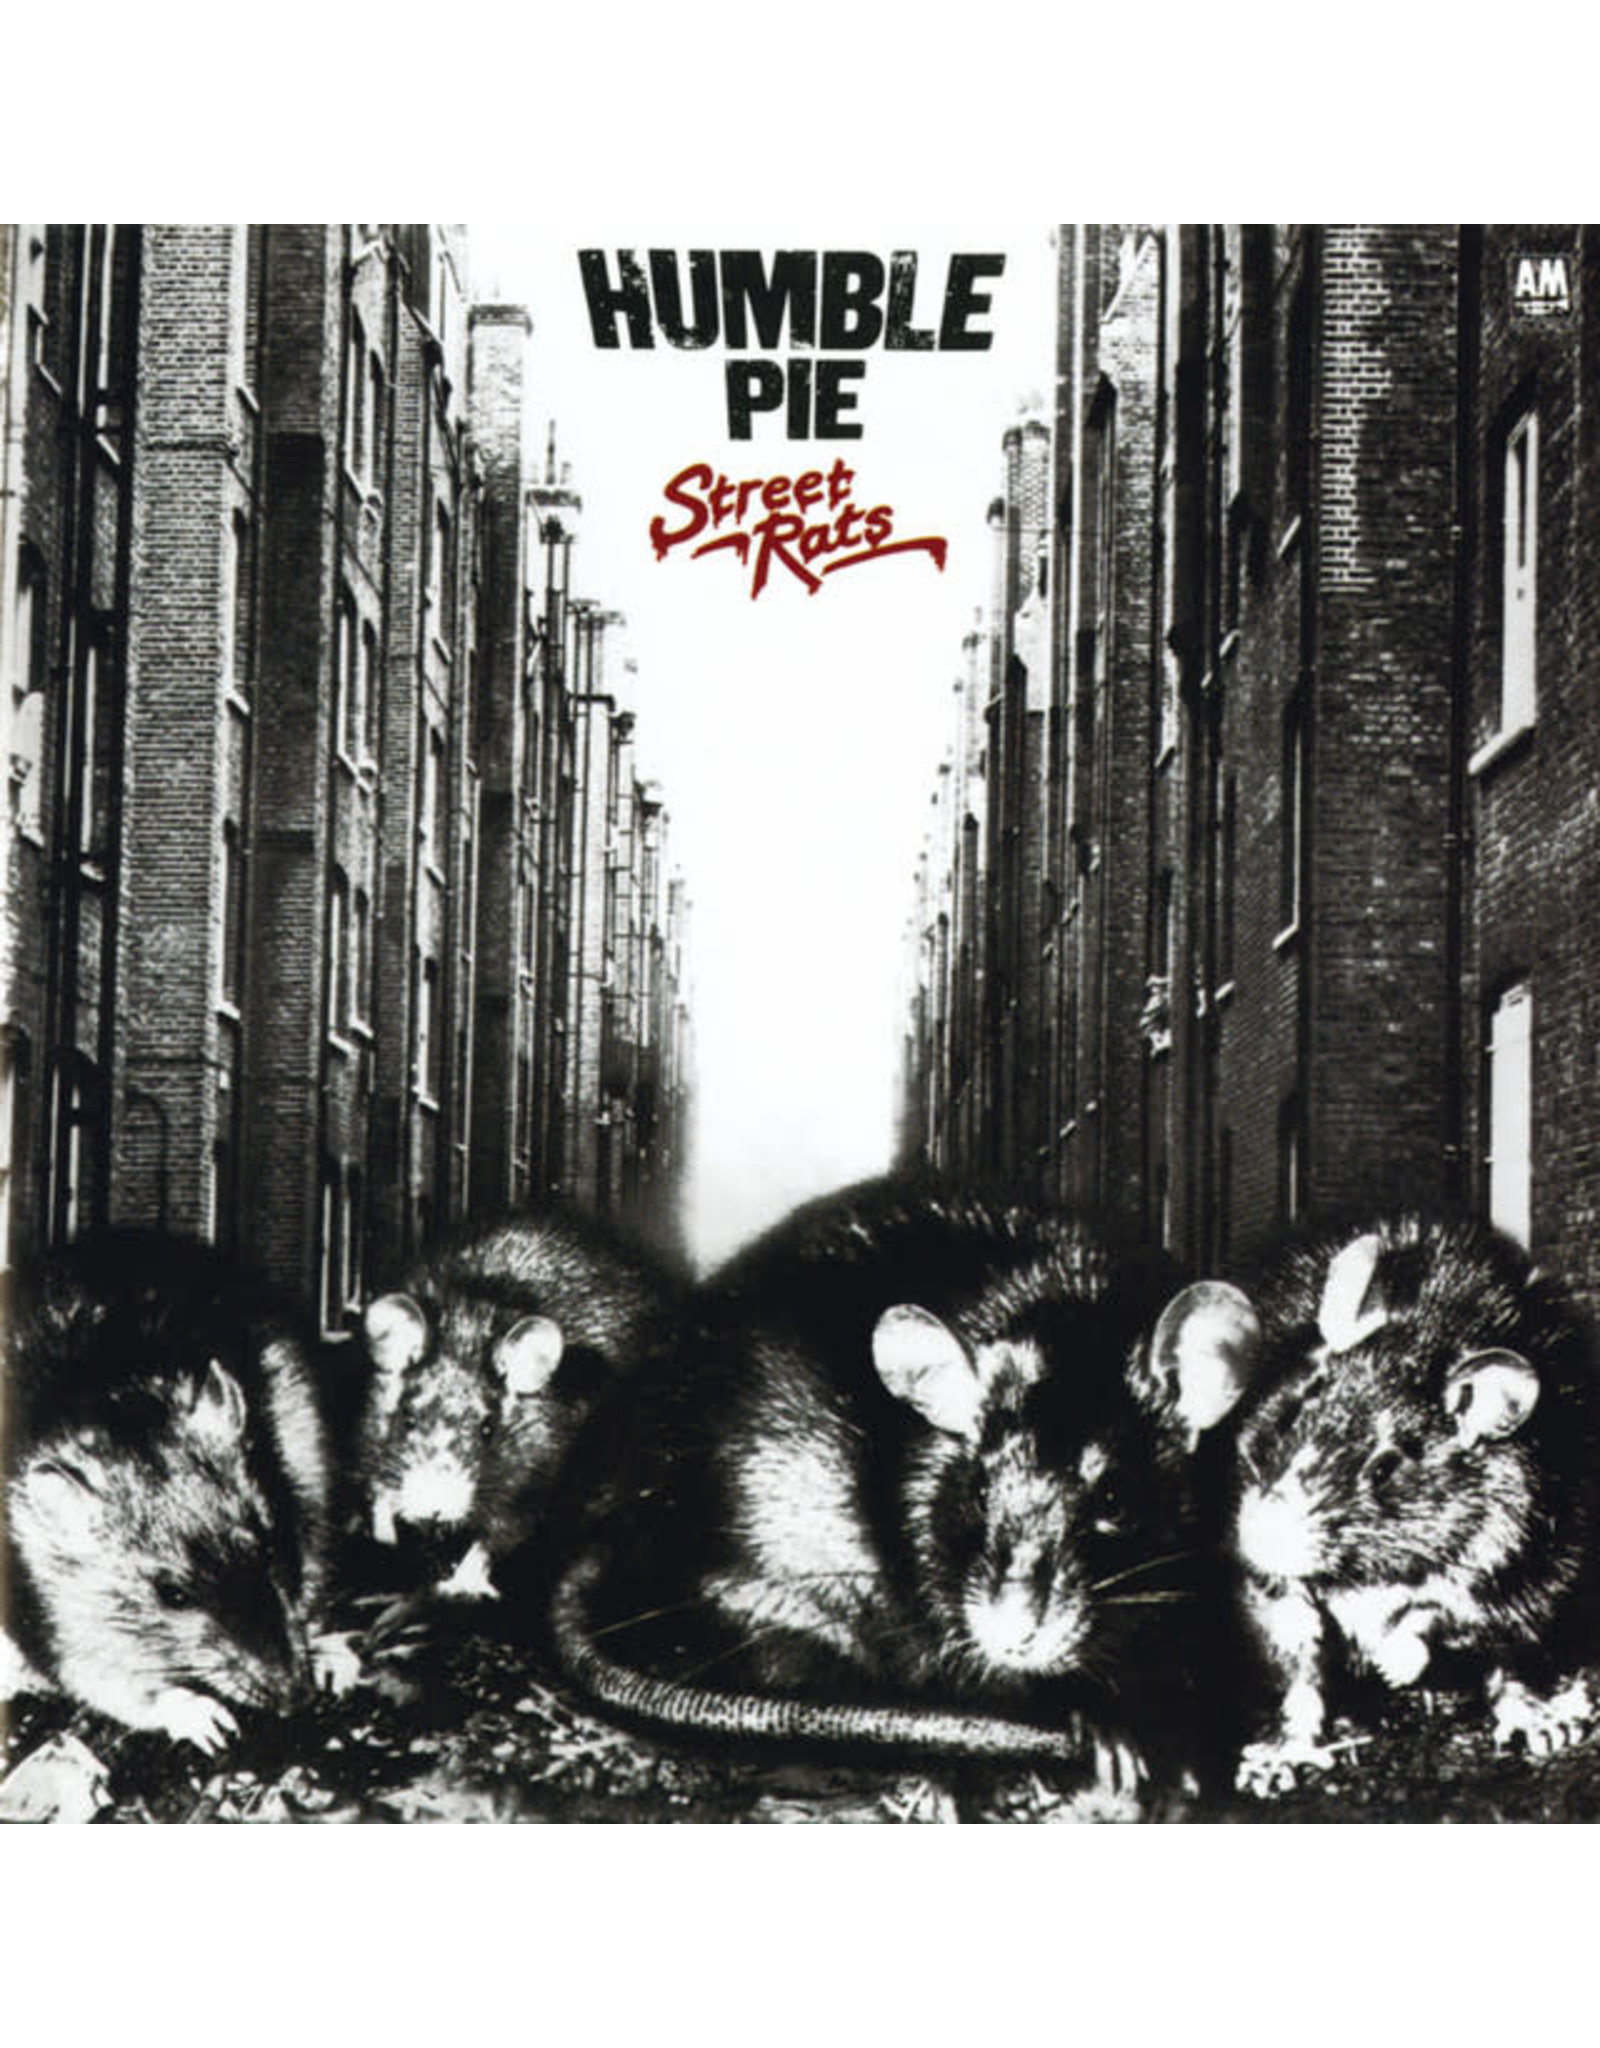 Vinyl Humble Pie - Street Rats. Final Sale